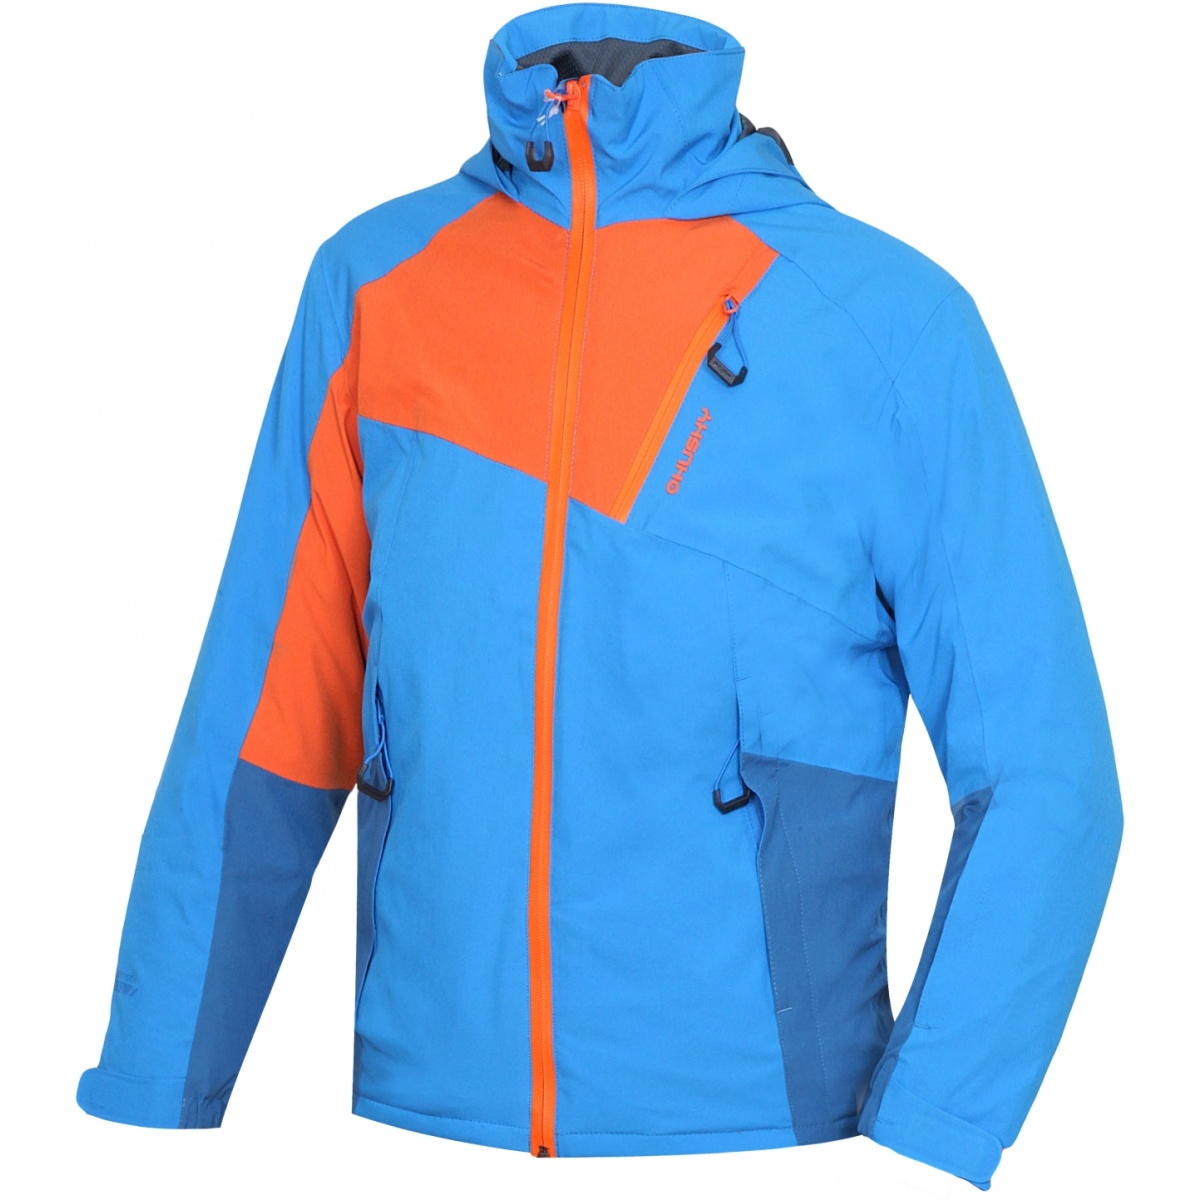 77dcb49f7474 Dětská ski bunda - Zawi Kids – modrá